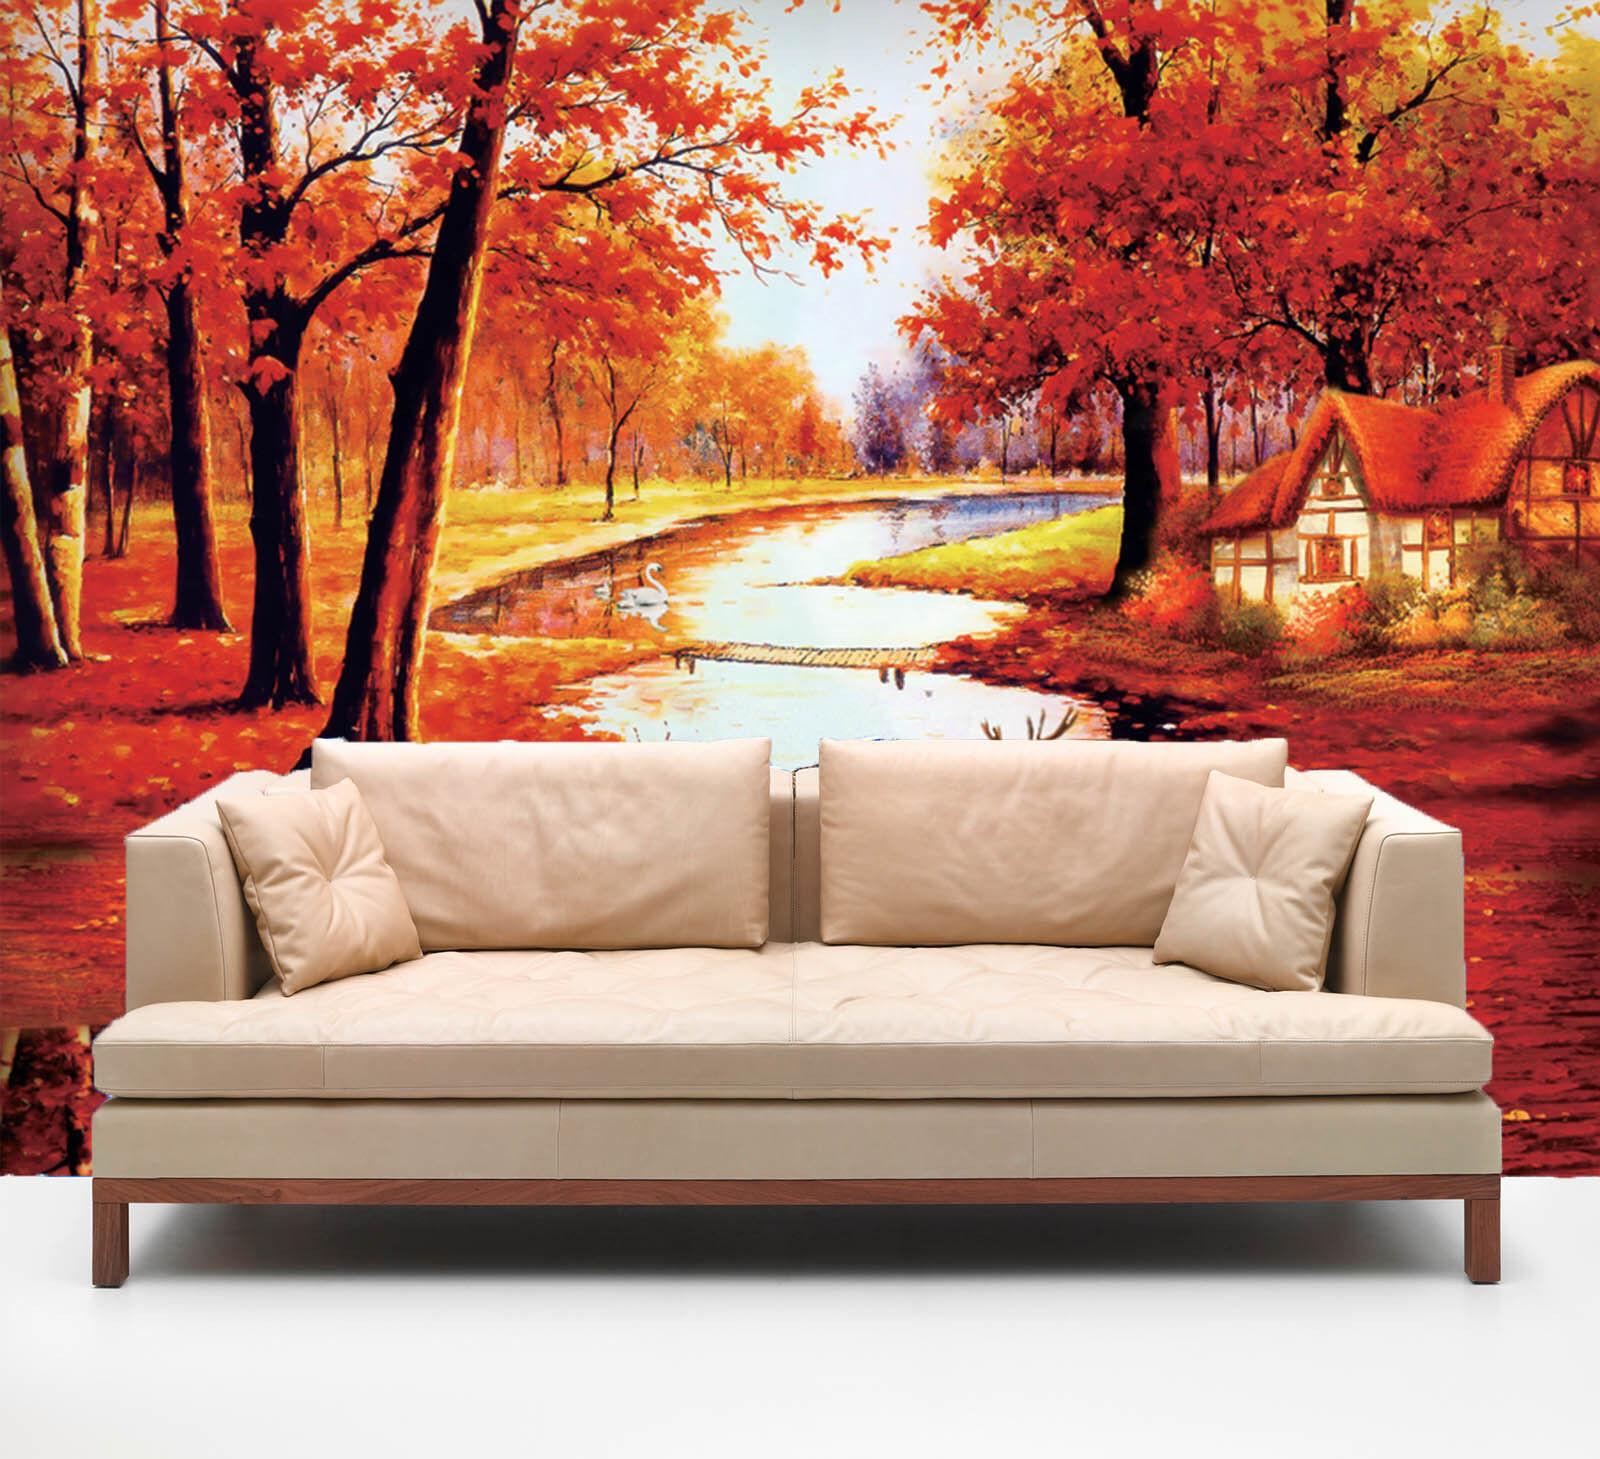 3D Orange Scenery 618 WallPaper Murals Wall Print Decal Wall Deco AJ WALLPAPER